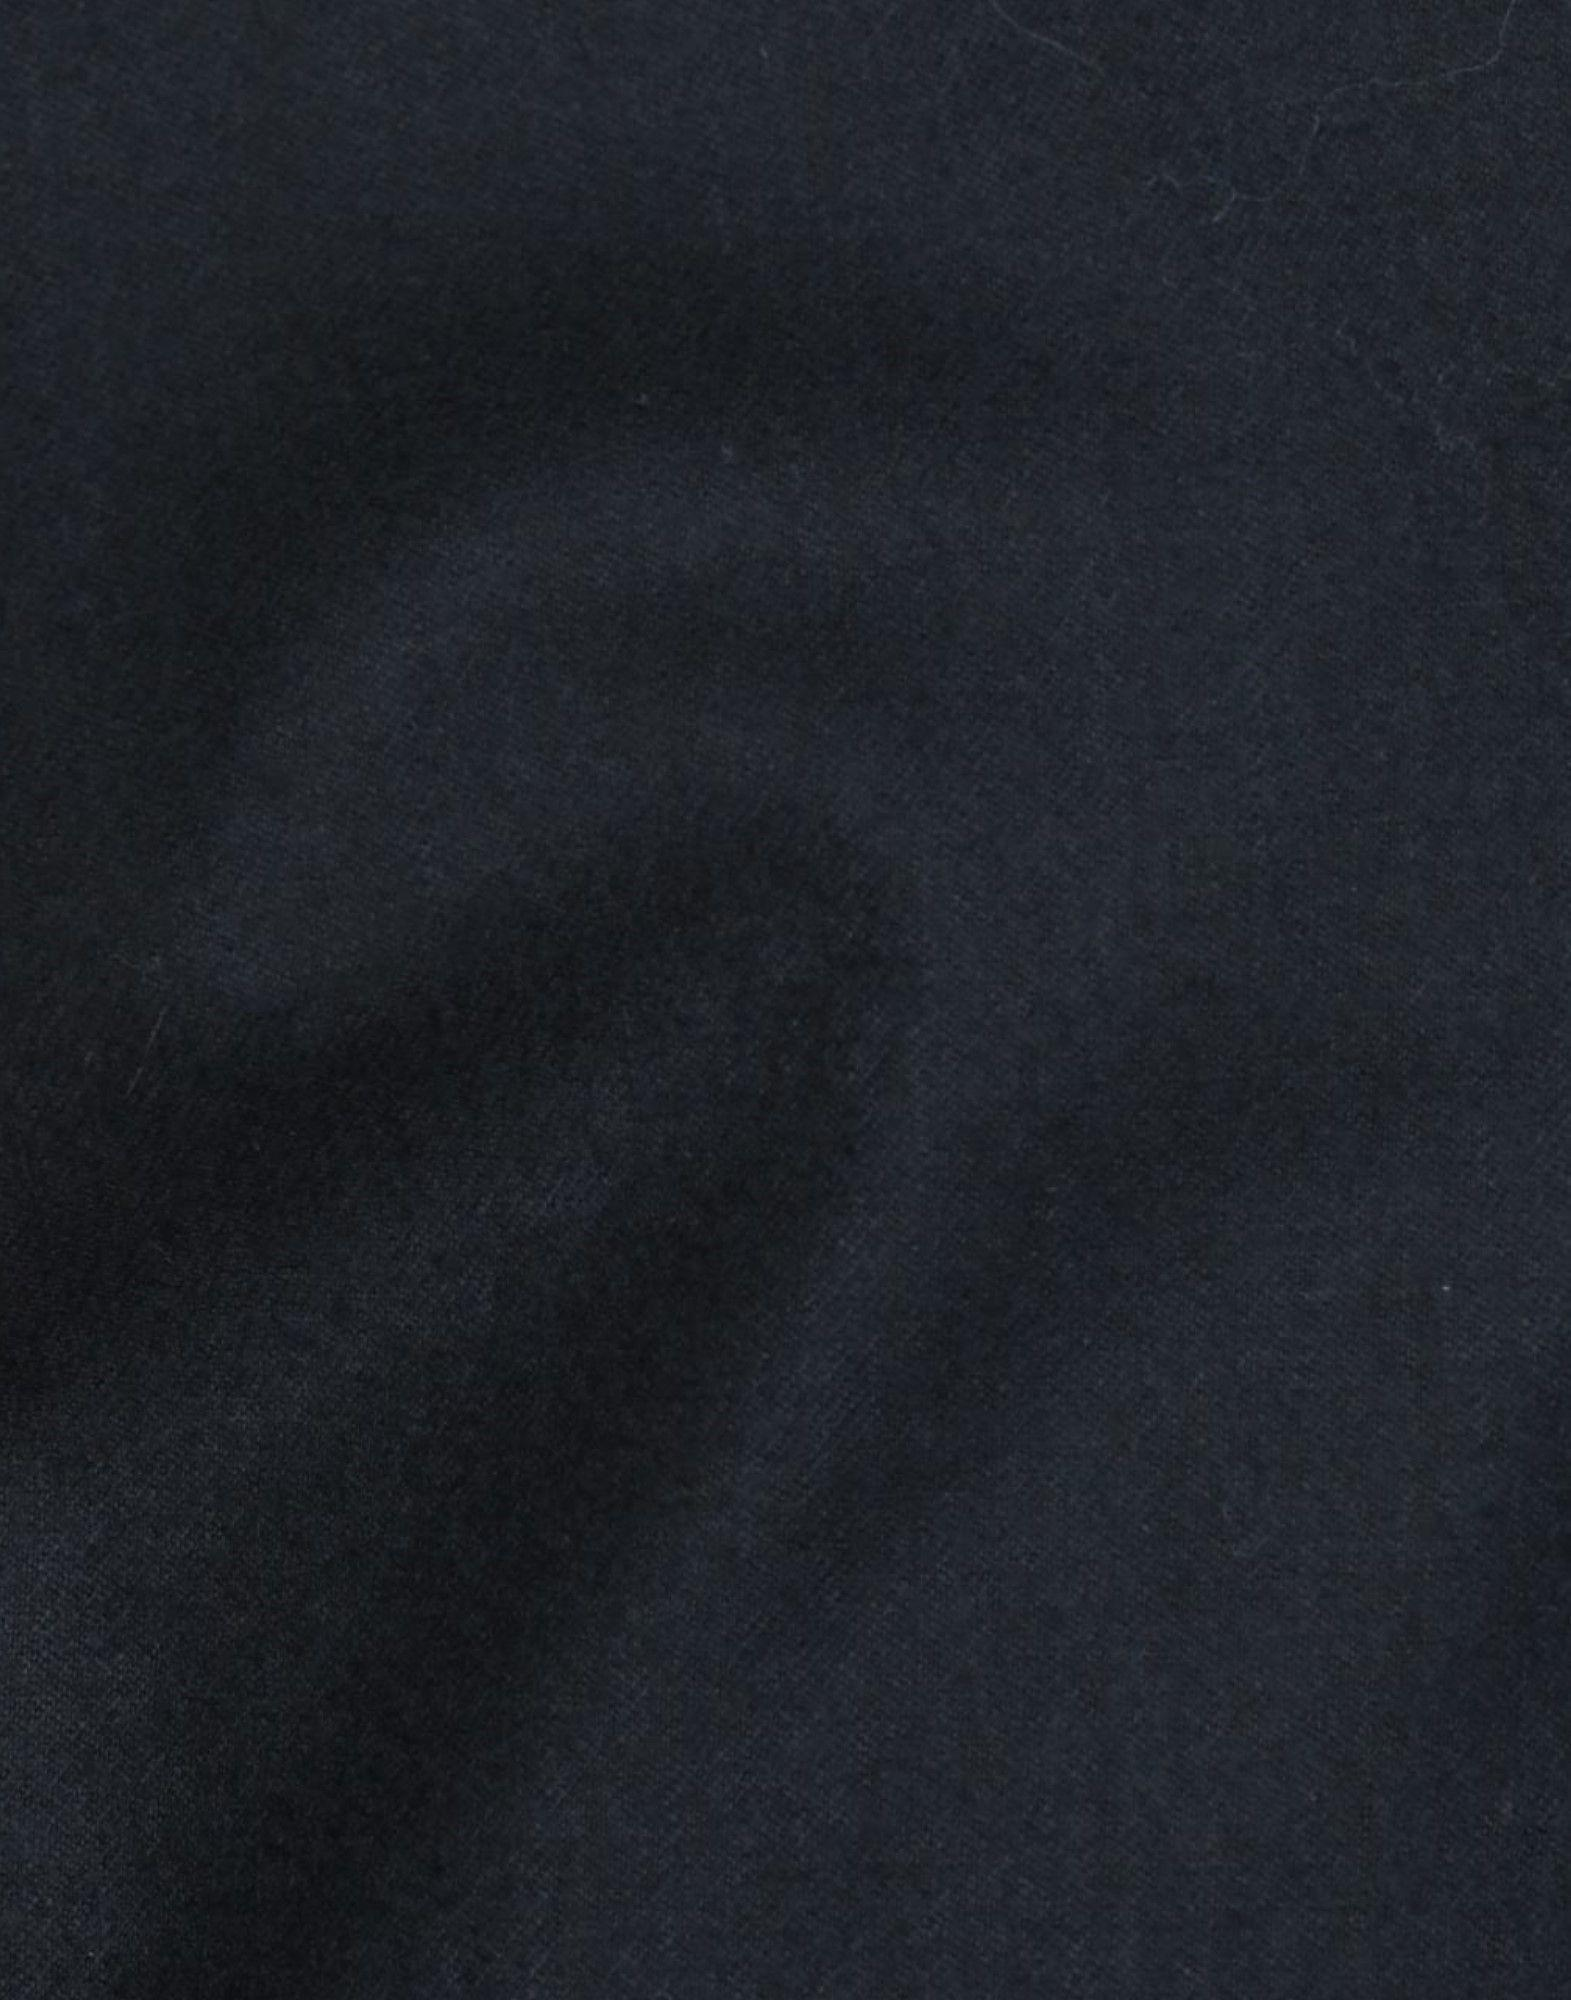 Pantalones Nine:inthe:morning de Franela de color Azul